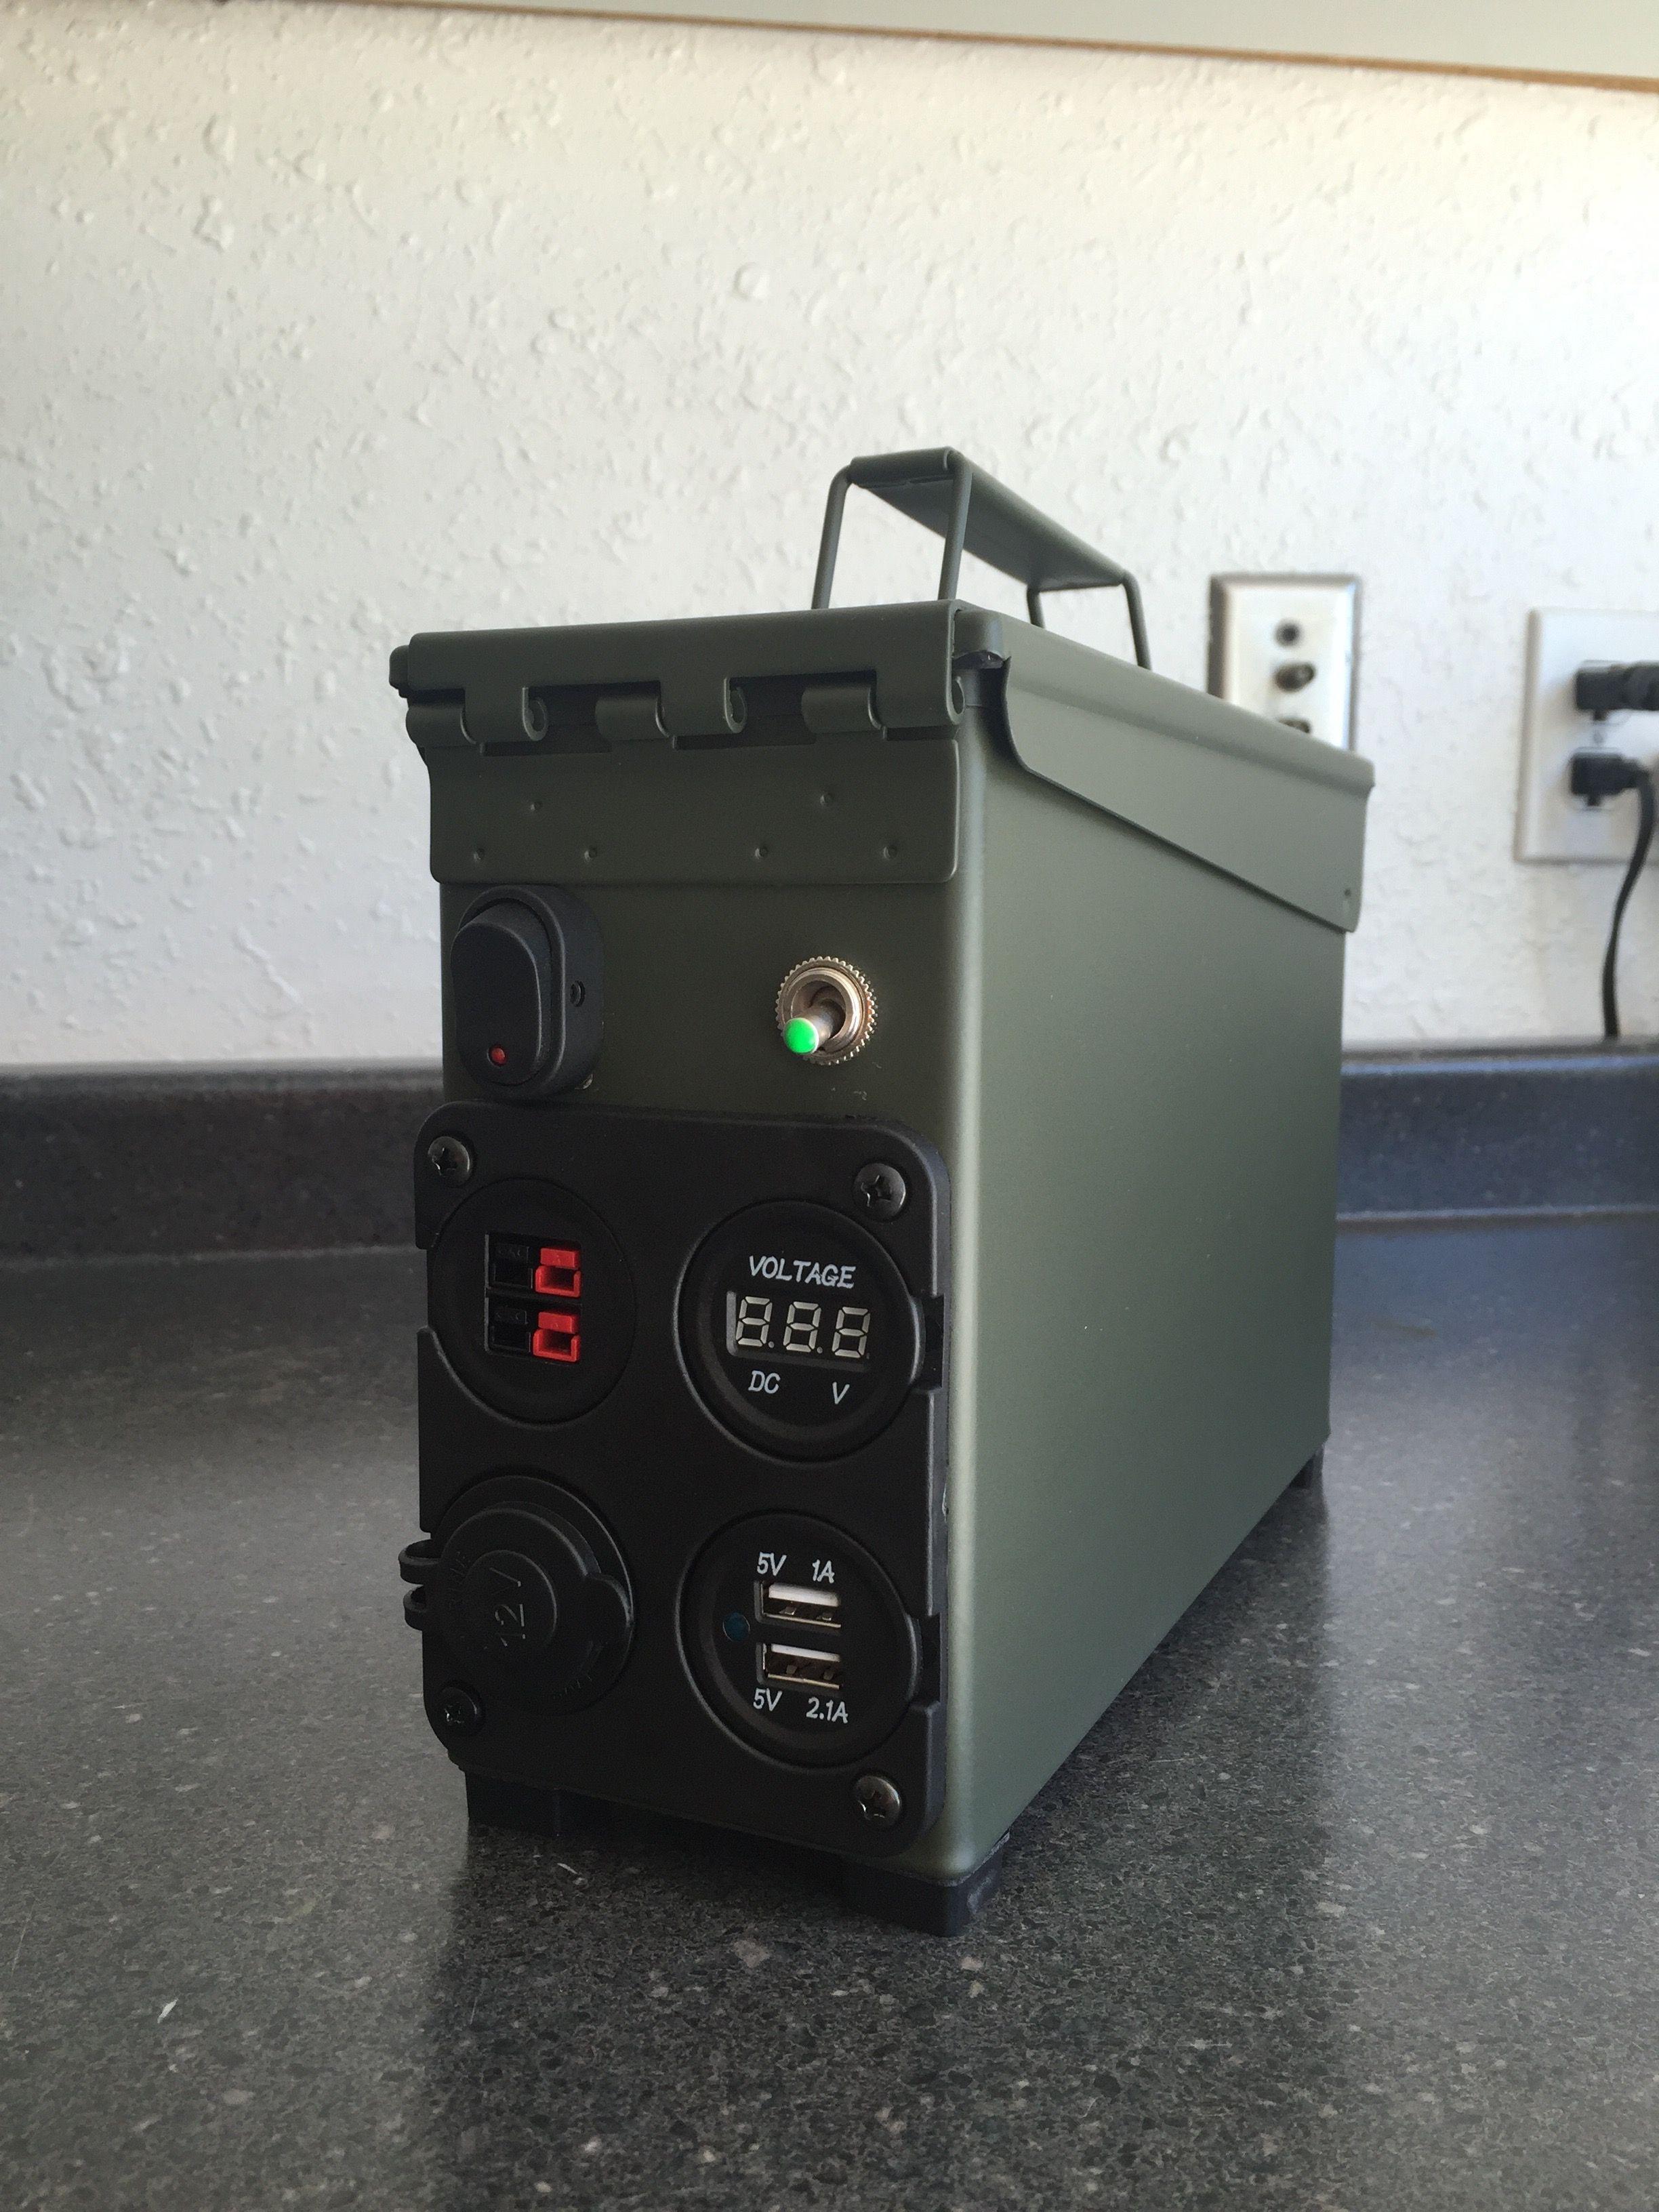 Shtf Battery Box 17ah By N6voa Outdoors Pinterest Solar Power Wiring Survival Skills